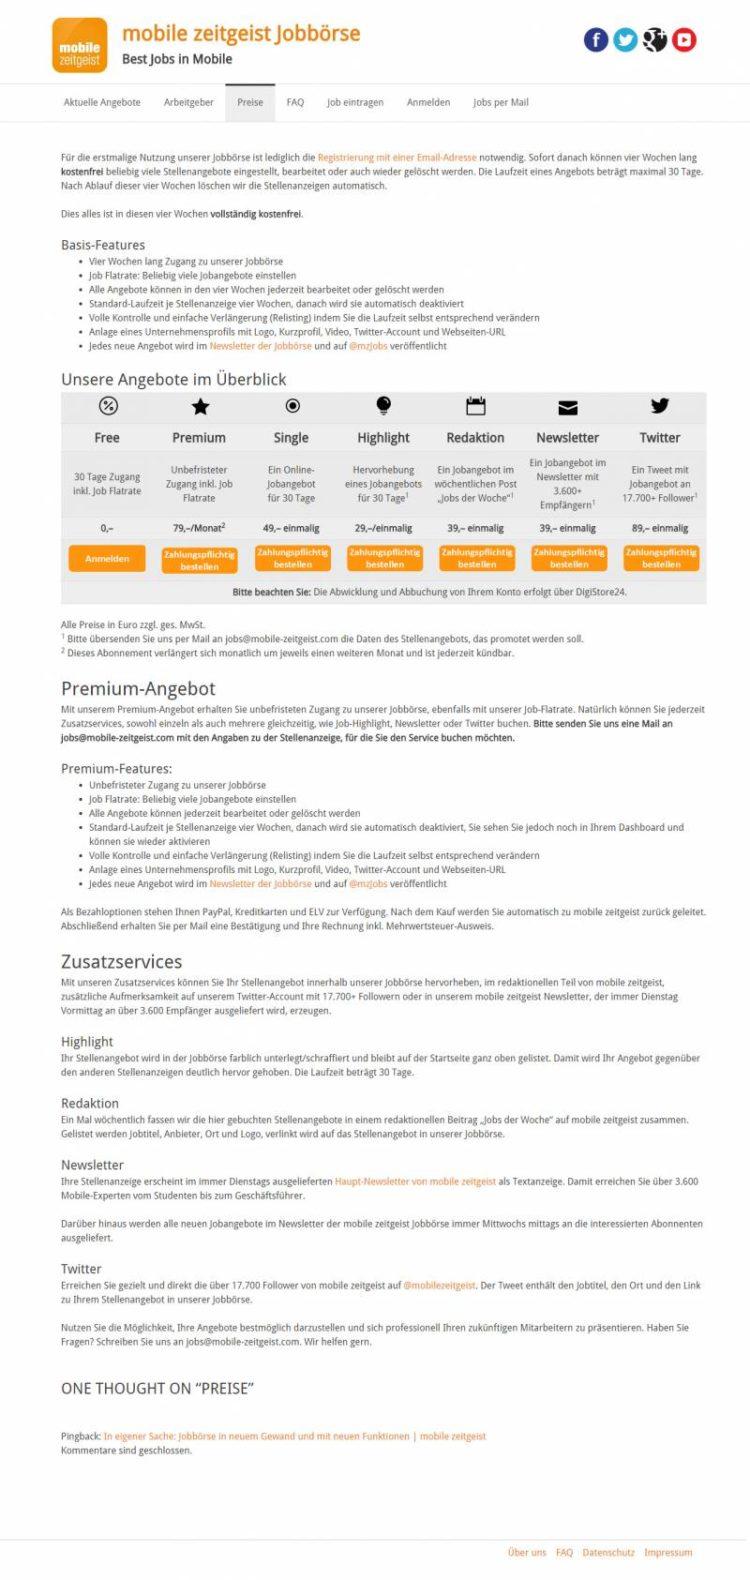 jobs.mobile-zeitgeist.com Preislisting Desktopansicht